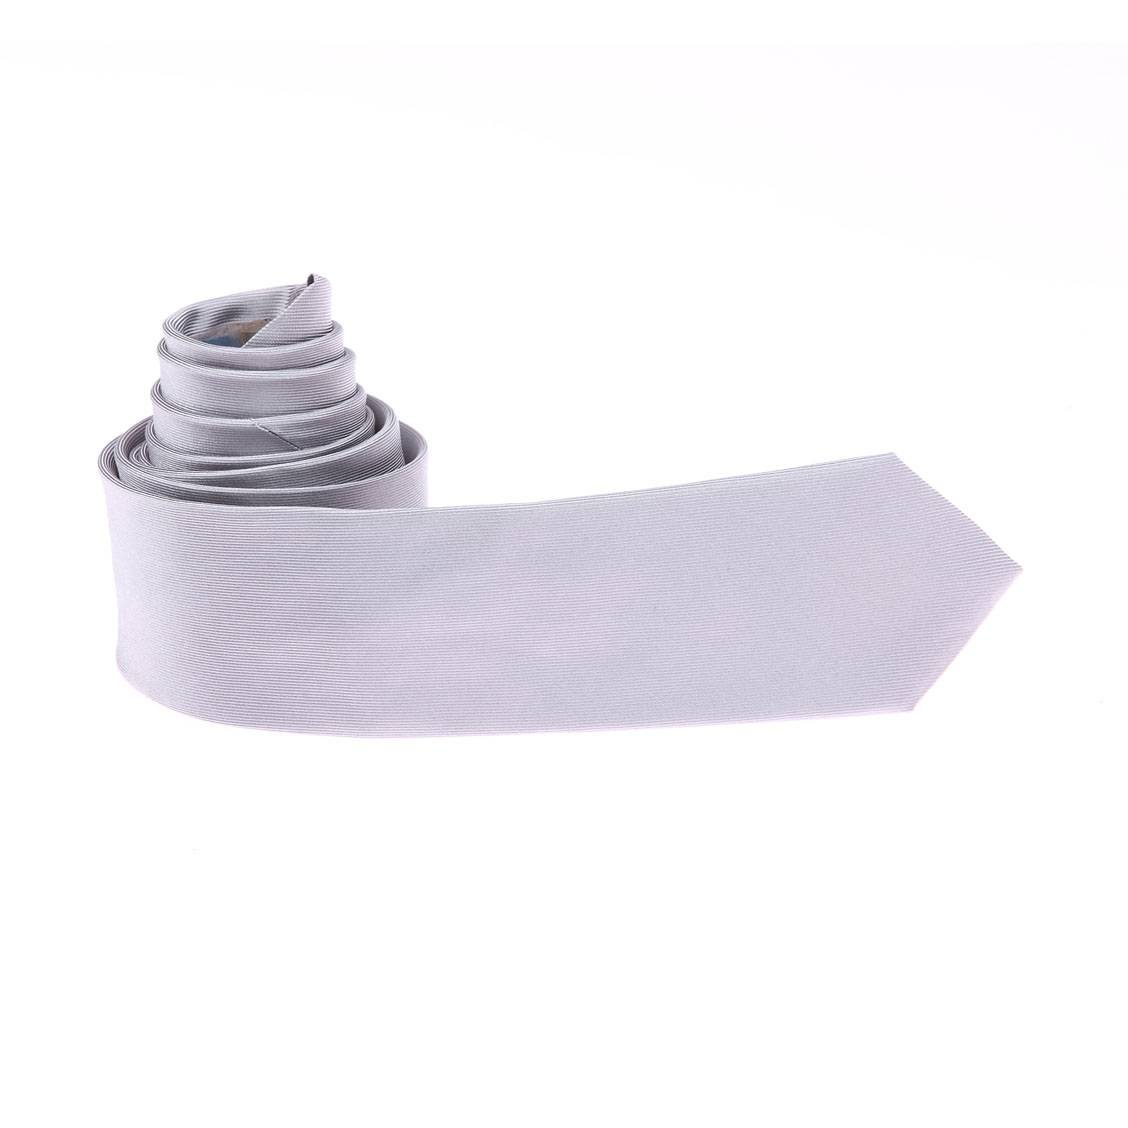 Cravate Antony Morato en soie grise perle